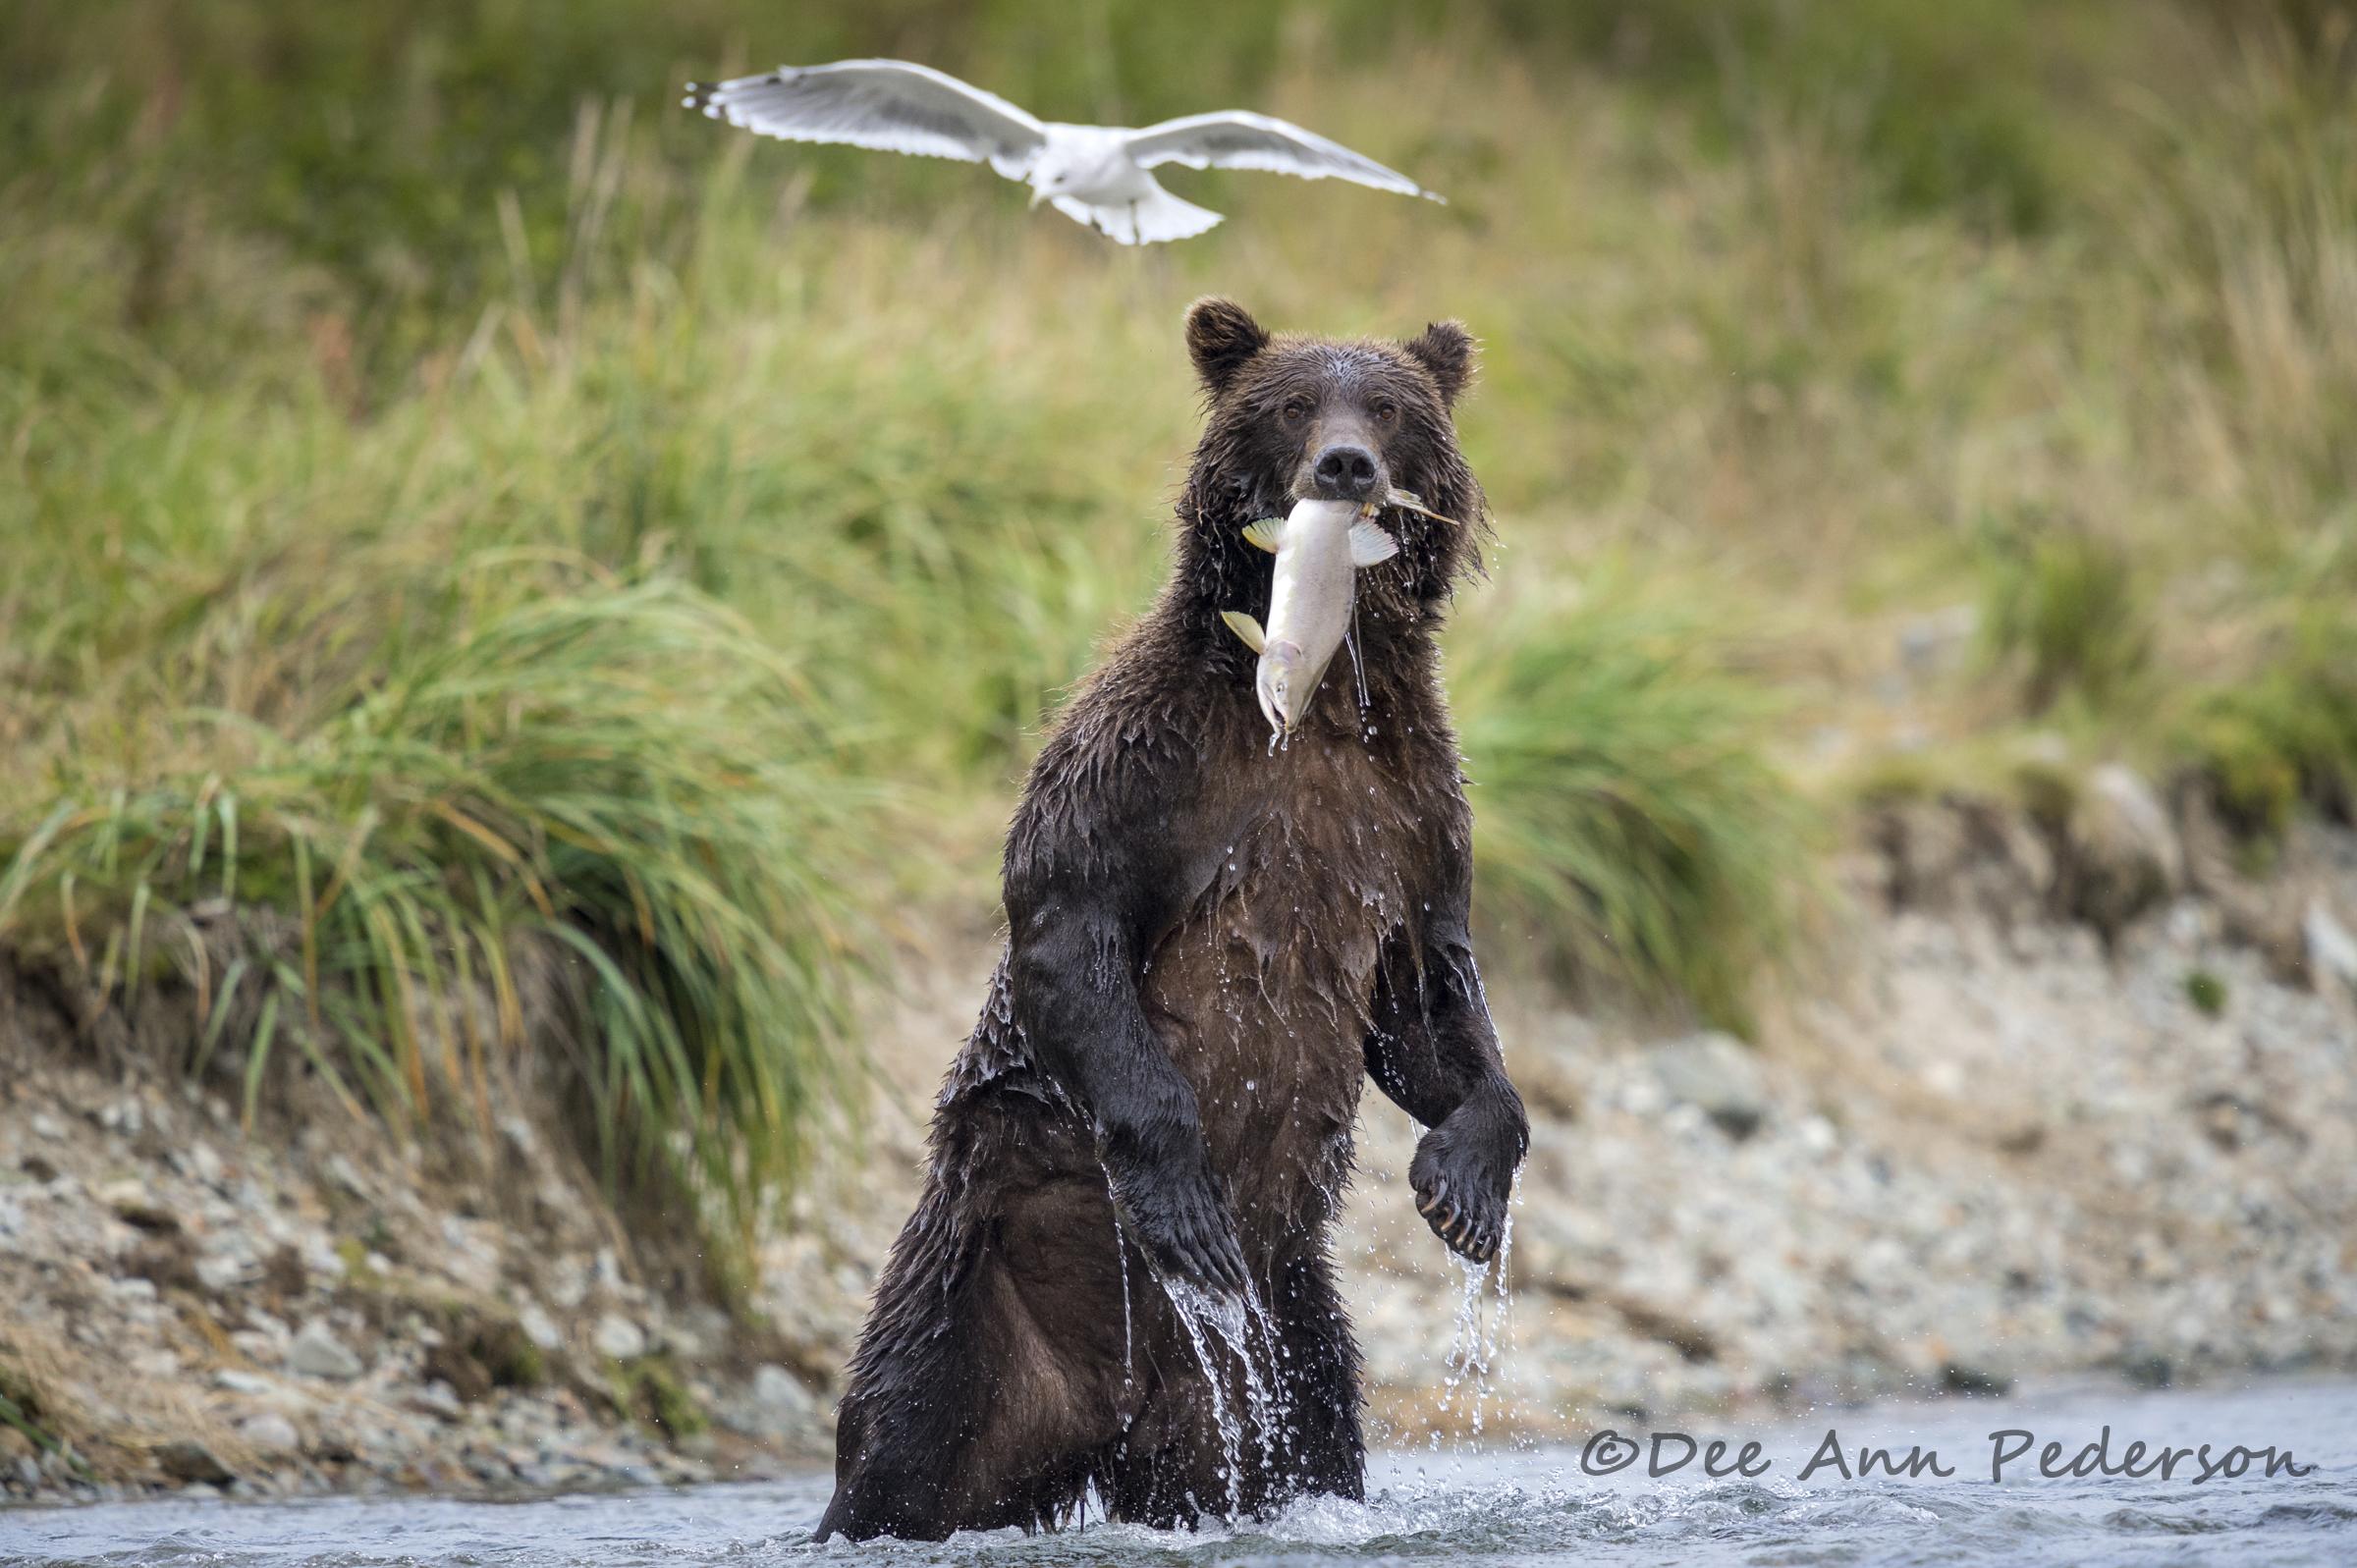 DPederson-Passionate&FavoriteAnimal&Biodiversity20140907_DP__D4S3669.jpg